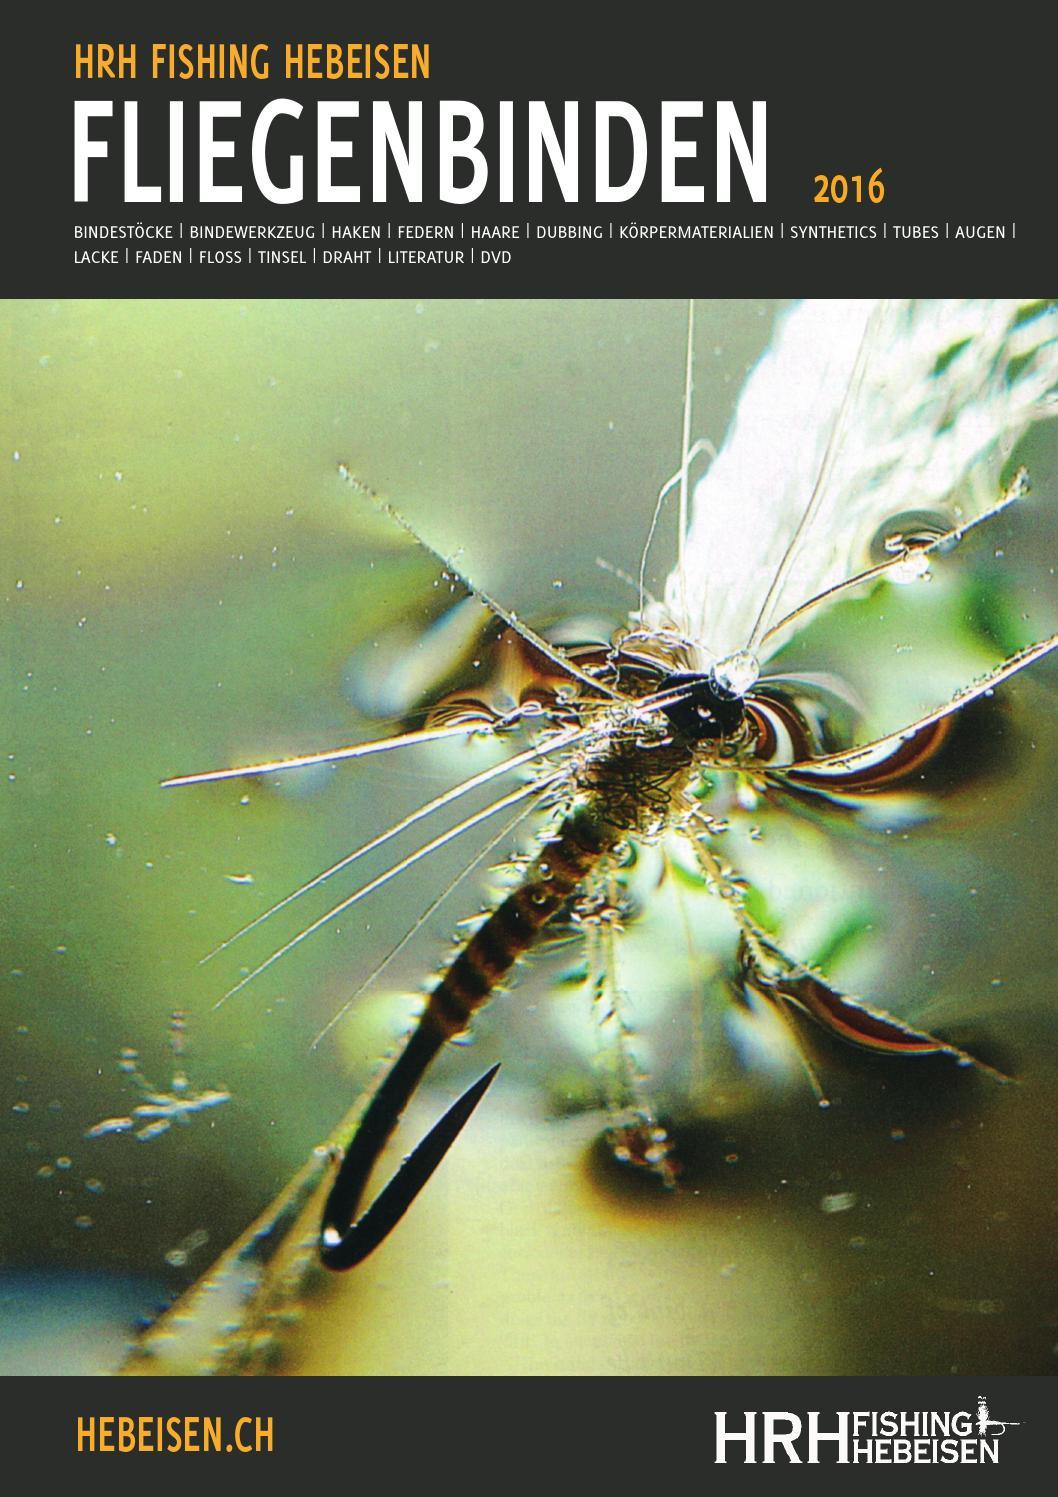 EP Minnow Head UV Brush 6 Stränge a´25 cm UV MINNOW GREY